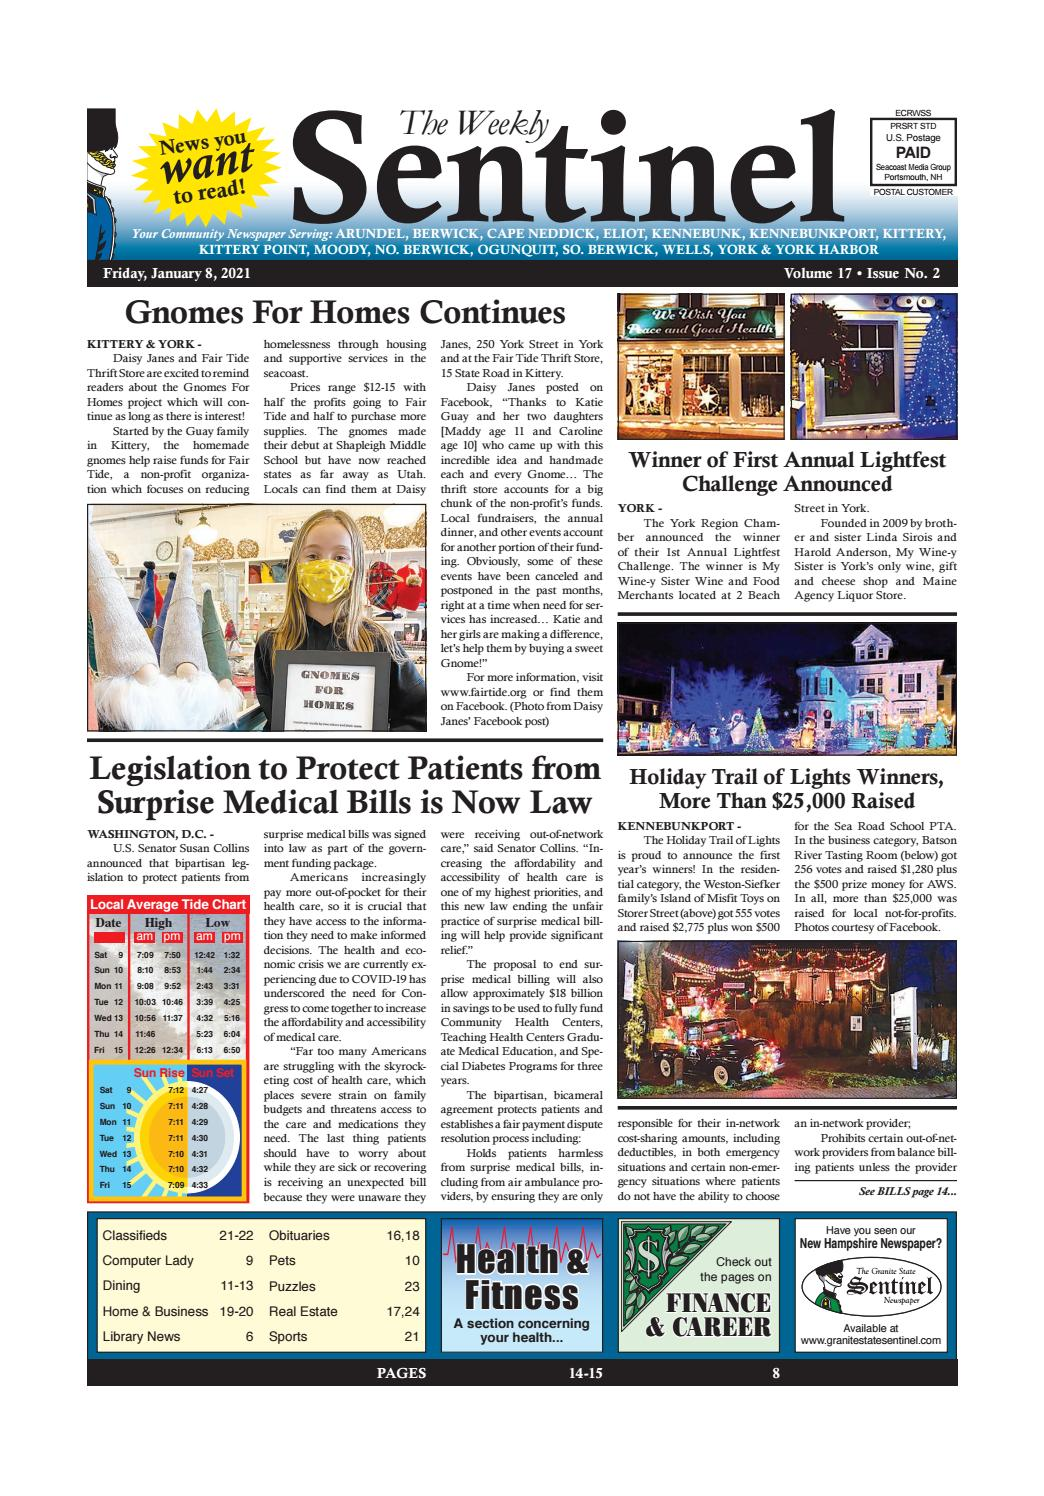 Clarksburg Trash Pickup On Christmas Eve 2021 Ws Jan 8 2021 By Weekly Sentinel Issuu